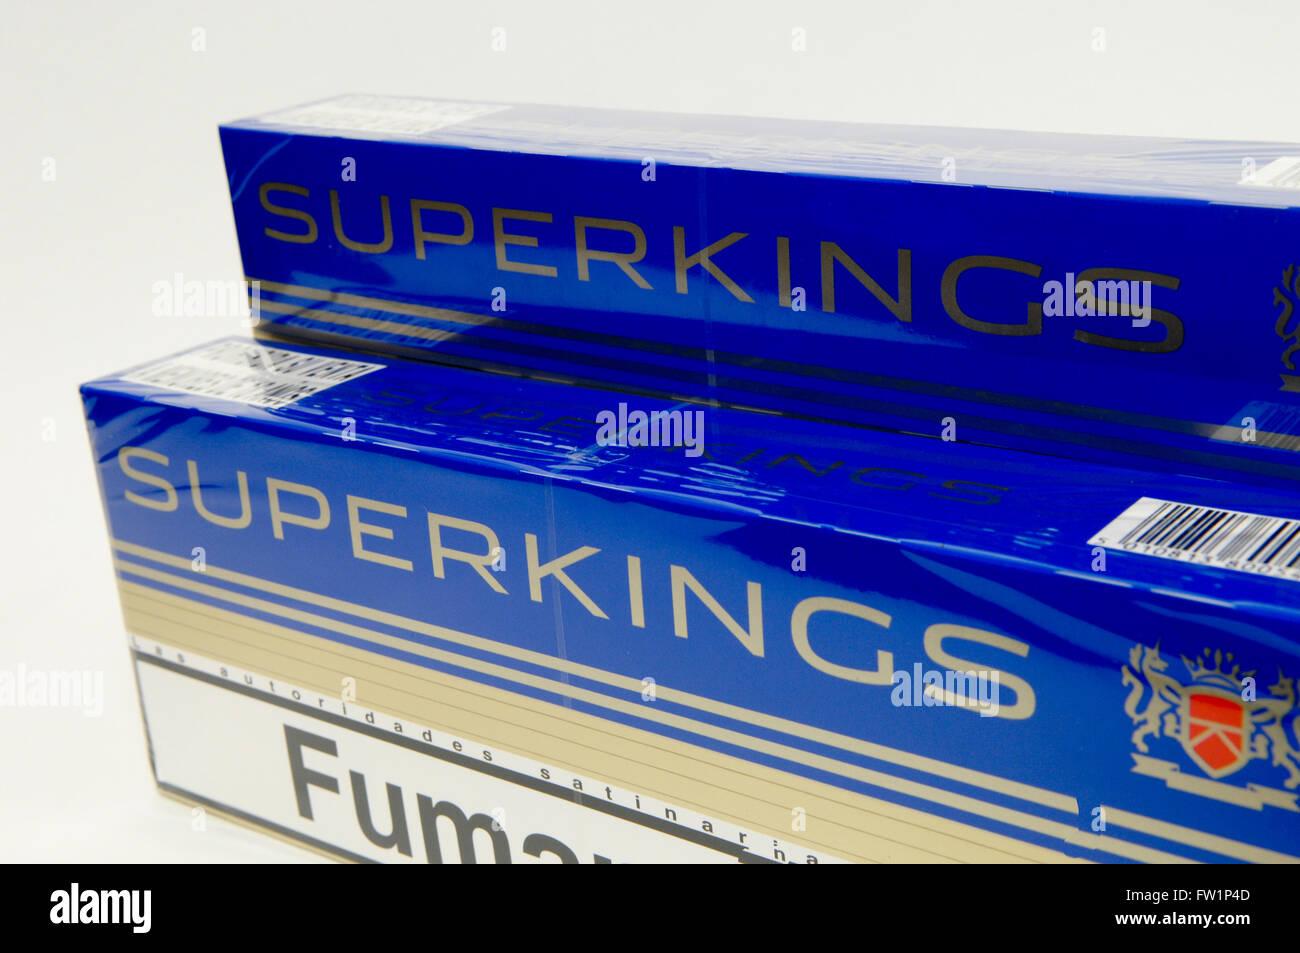 Superkings Stock Photos & Superkings Stock Images - Alamy